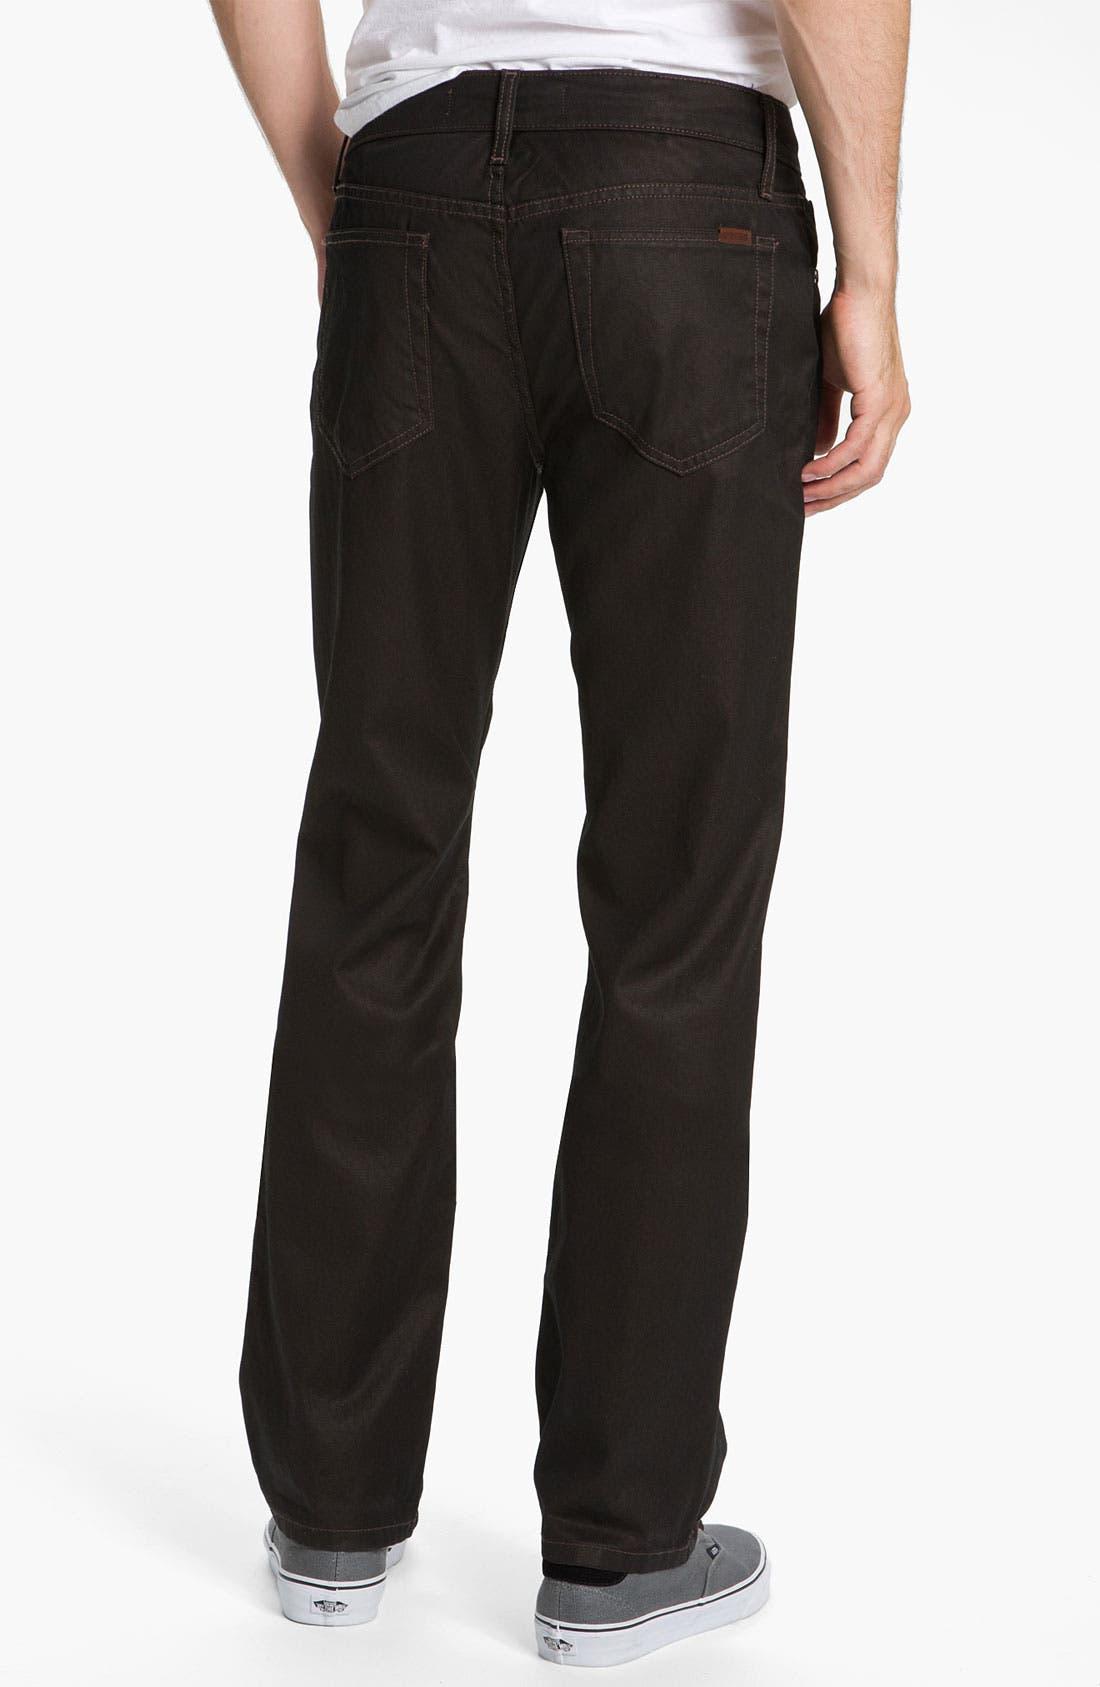 Alternate Image 1 Selected - Joe's 'Brixton' Slim Straight Leg Jeans (Diggs)